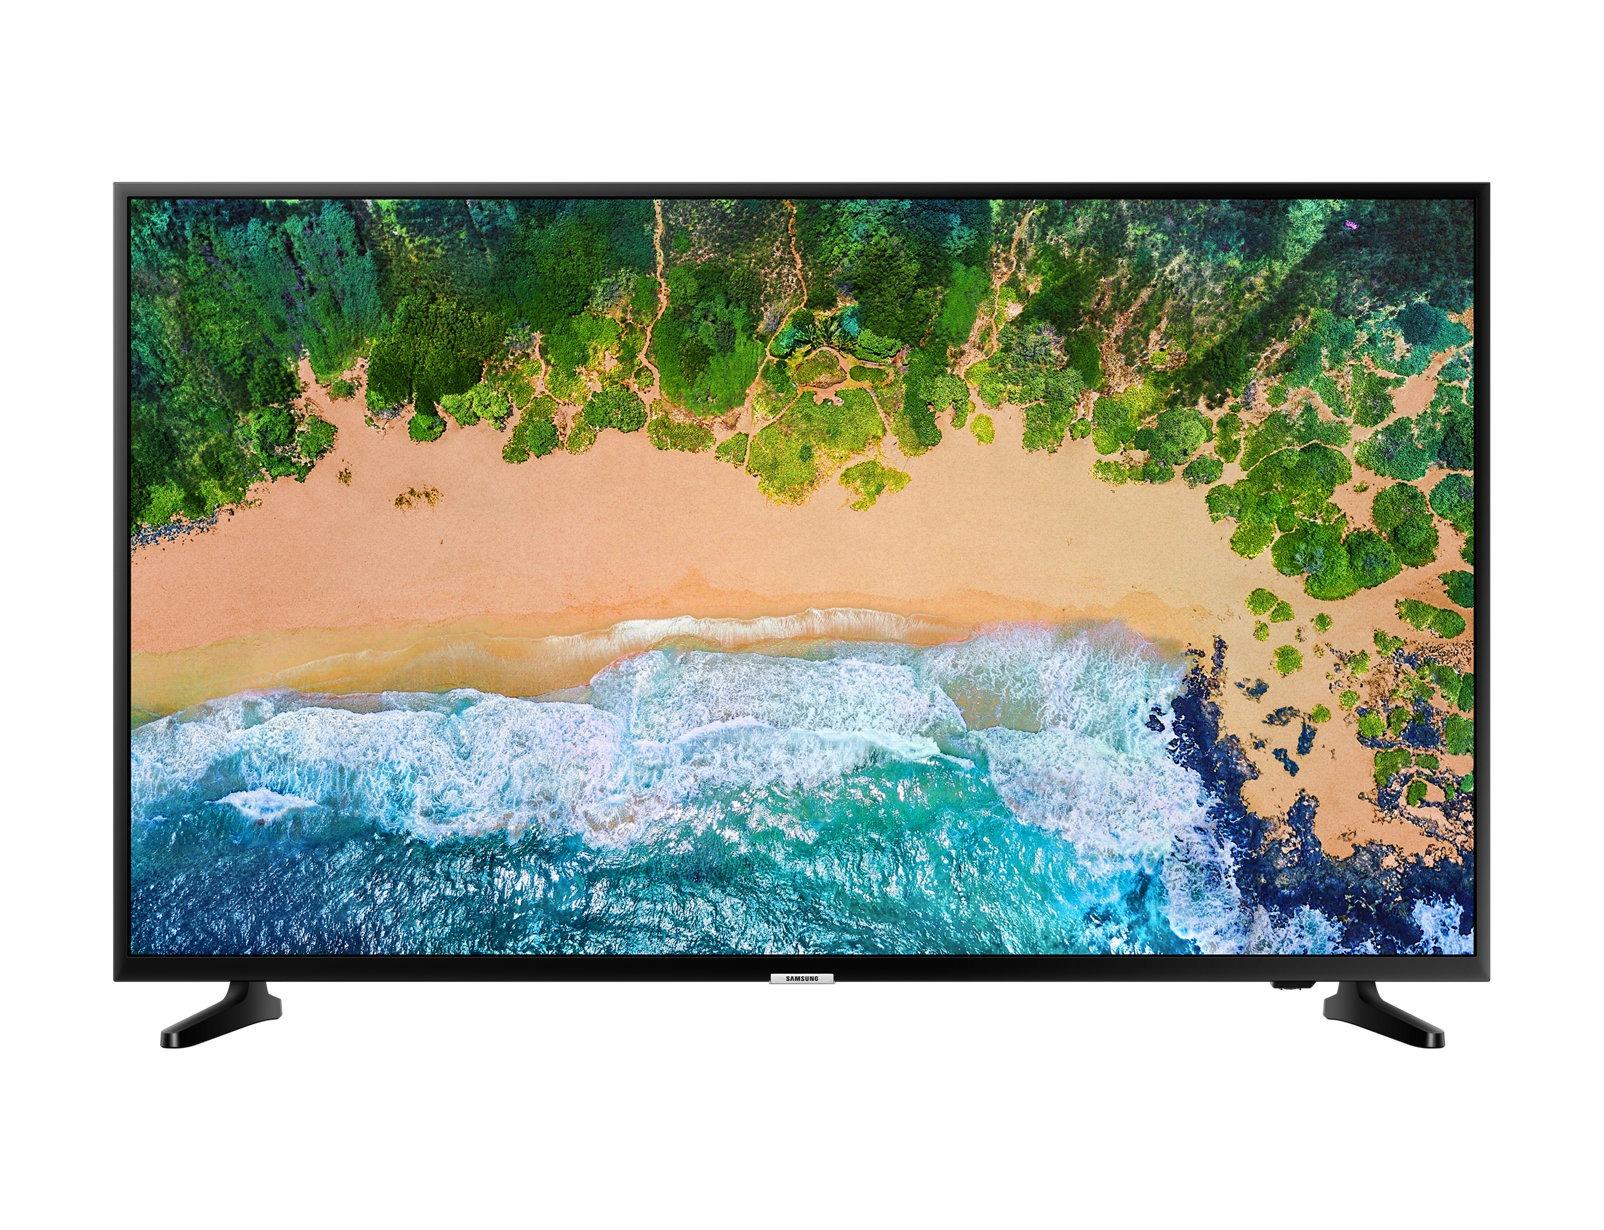 SAMSUNG UHD TV UE43NU7090